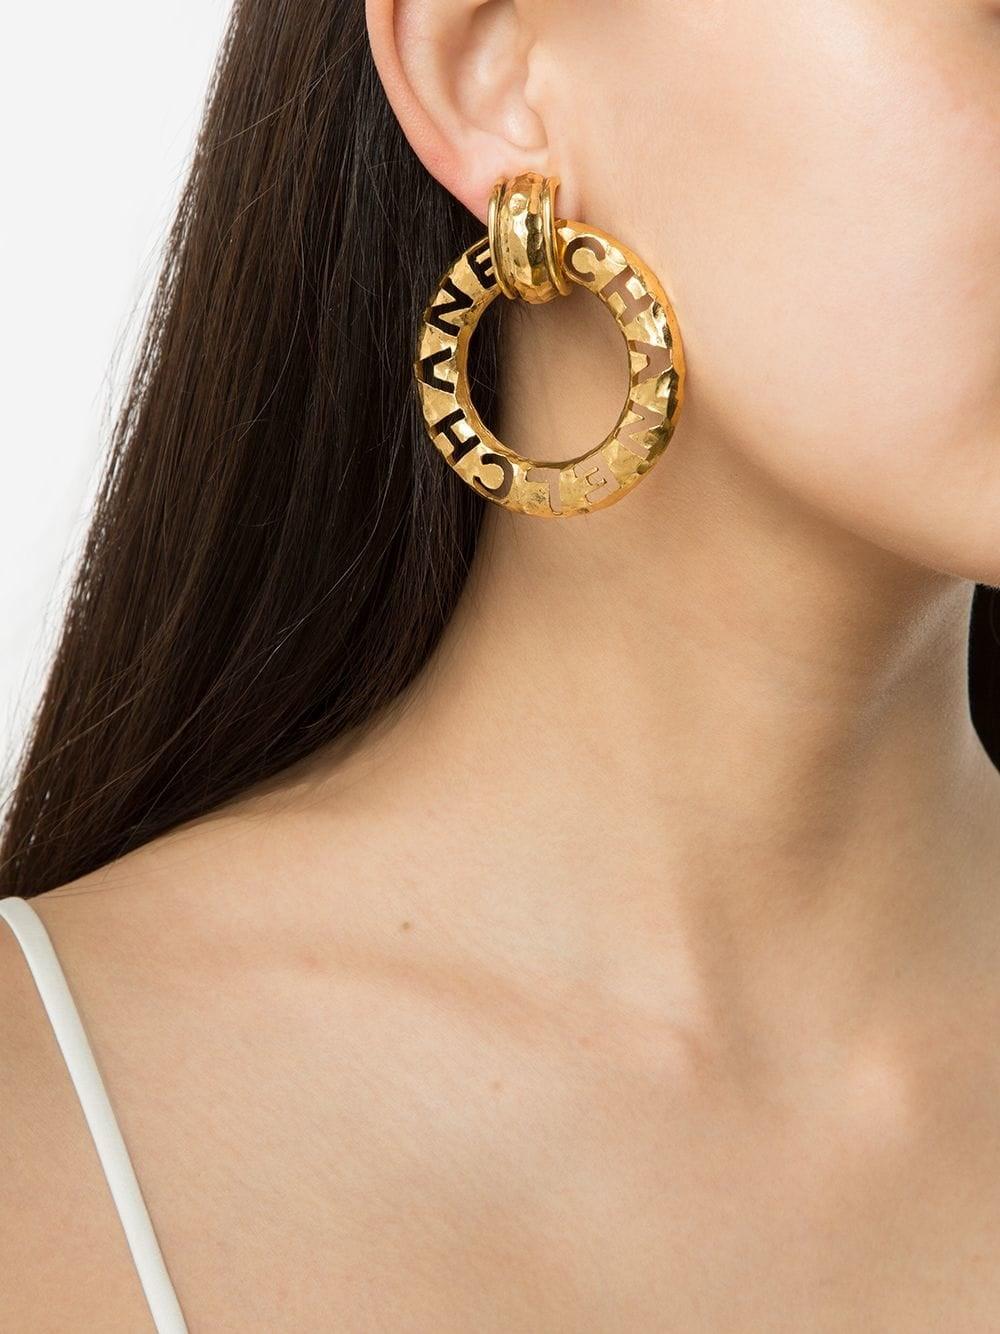 Chanel Vintage Logo Hoop Earrings  9 Stars Who We Fully Believe Sleep in  Their Gold Hoops  POPSUGAR Fashion Photo 28